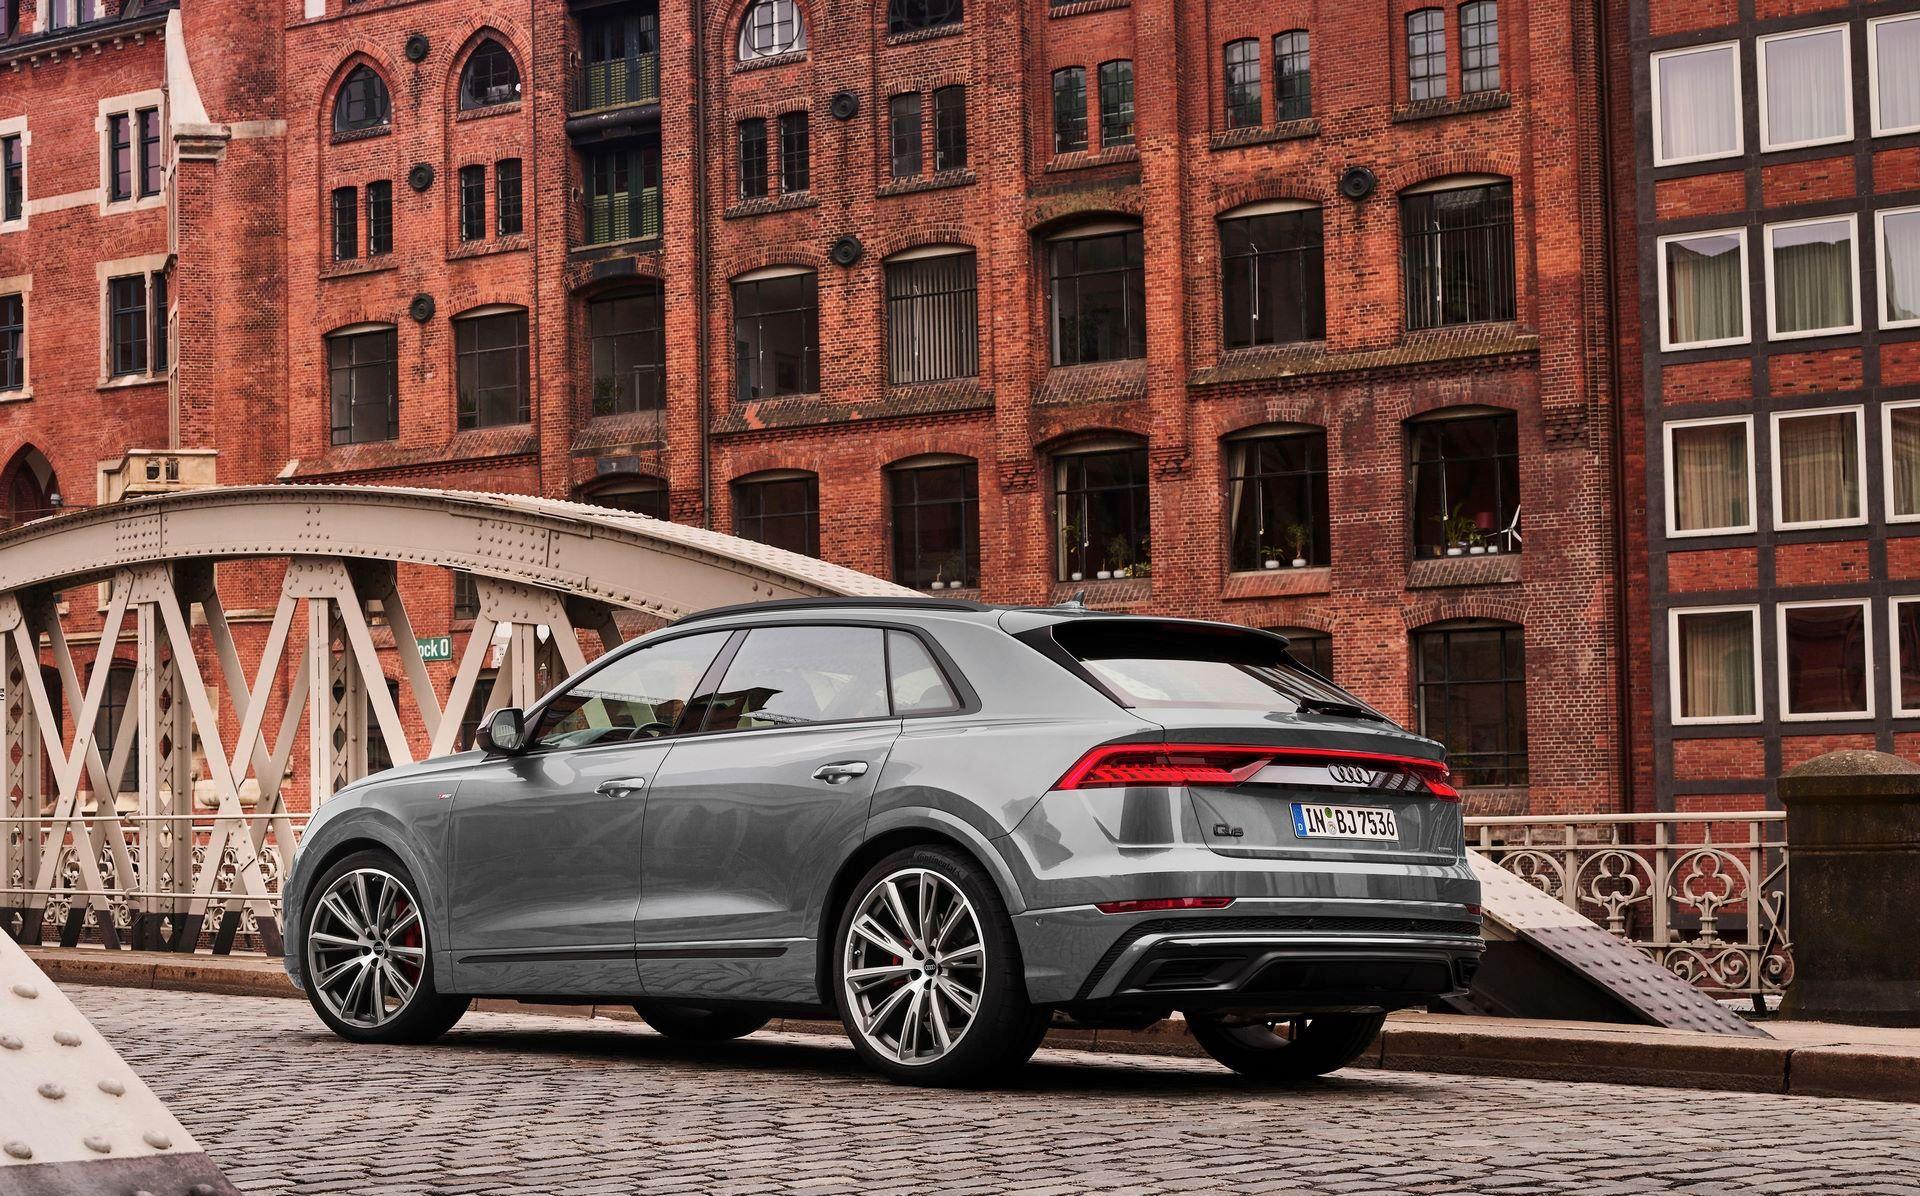 Audi-A4-A5-Q7-Q8-Competition-And-Competition-Plus-Trims-10